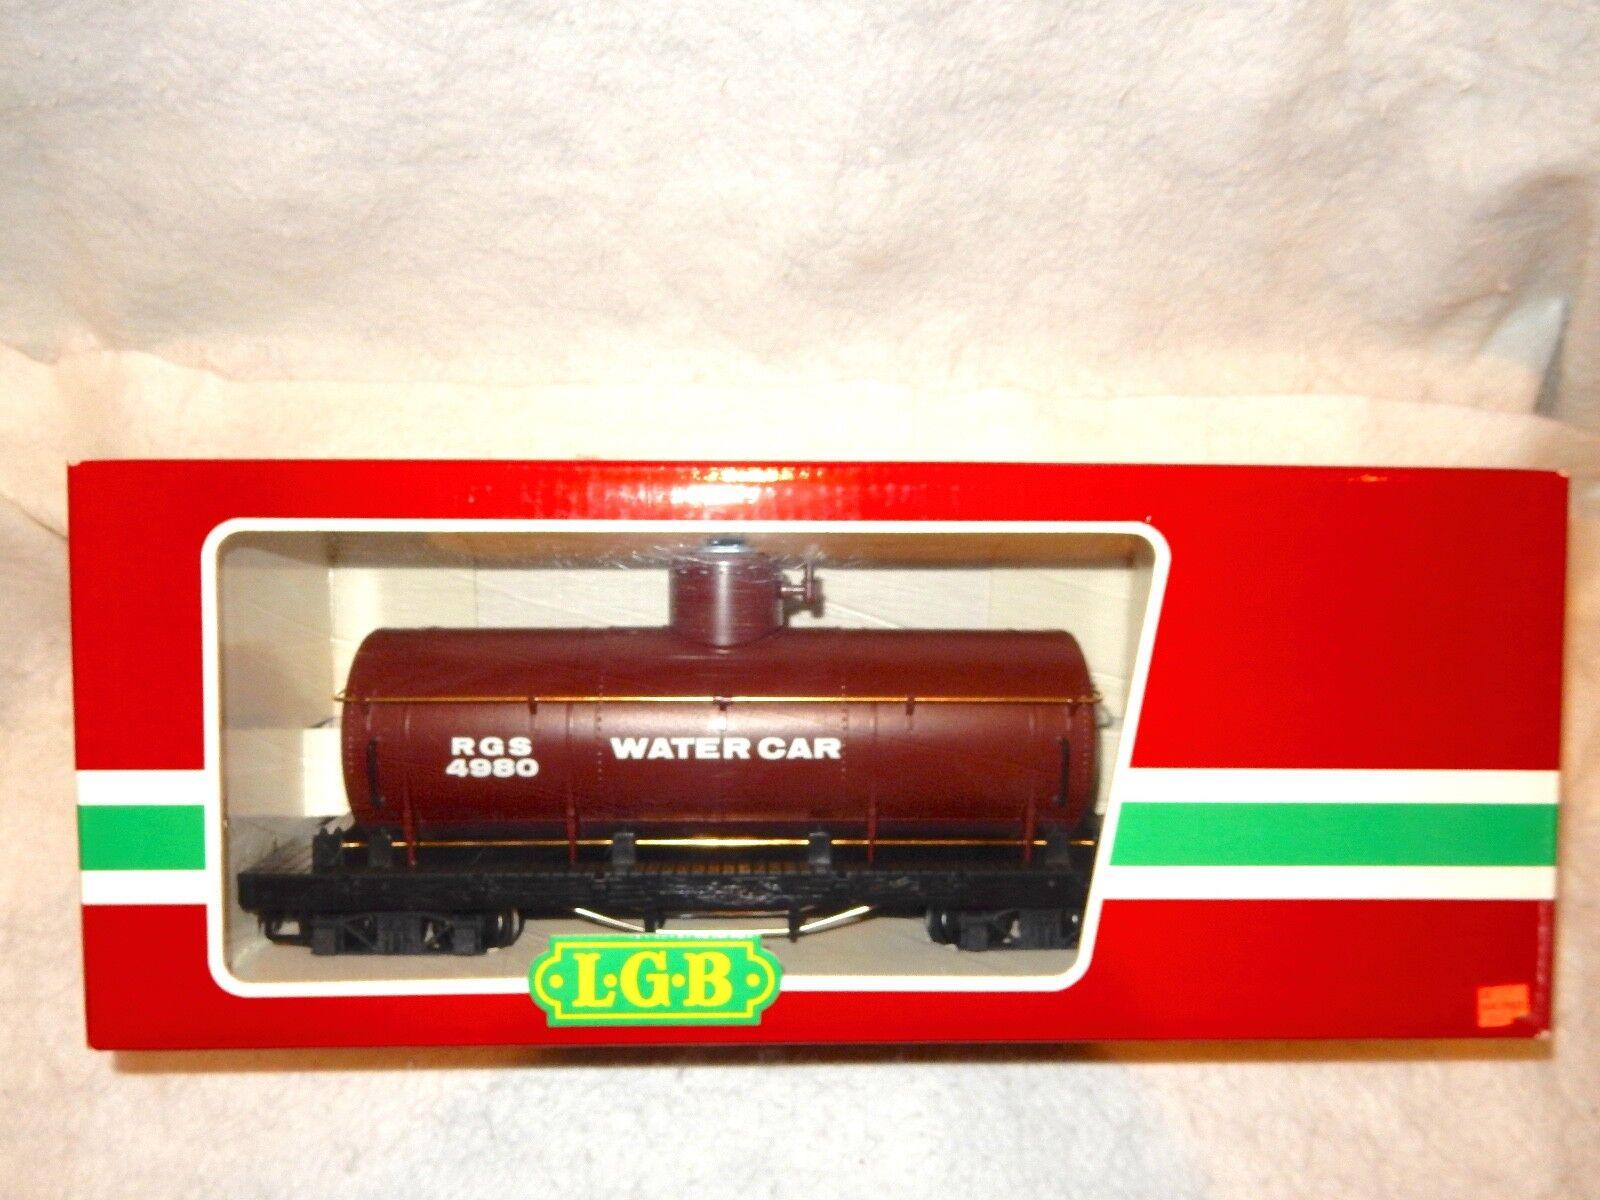 LGB Y 03 Rio Grande Southern single dome Water Car-G gauge- -New in box --